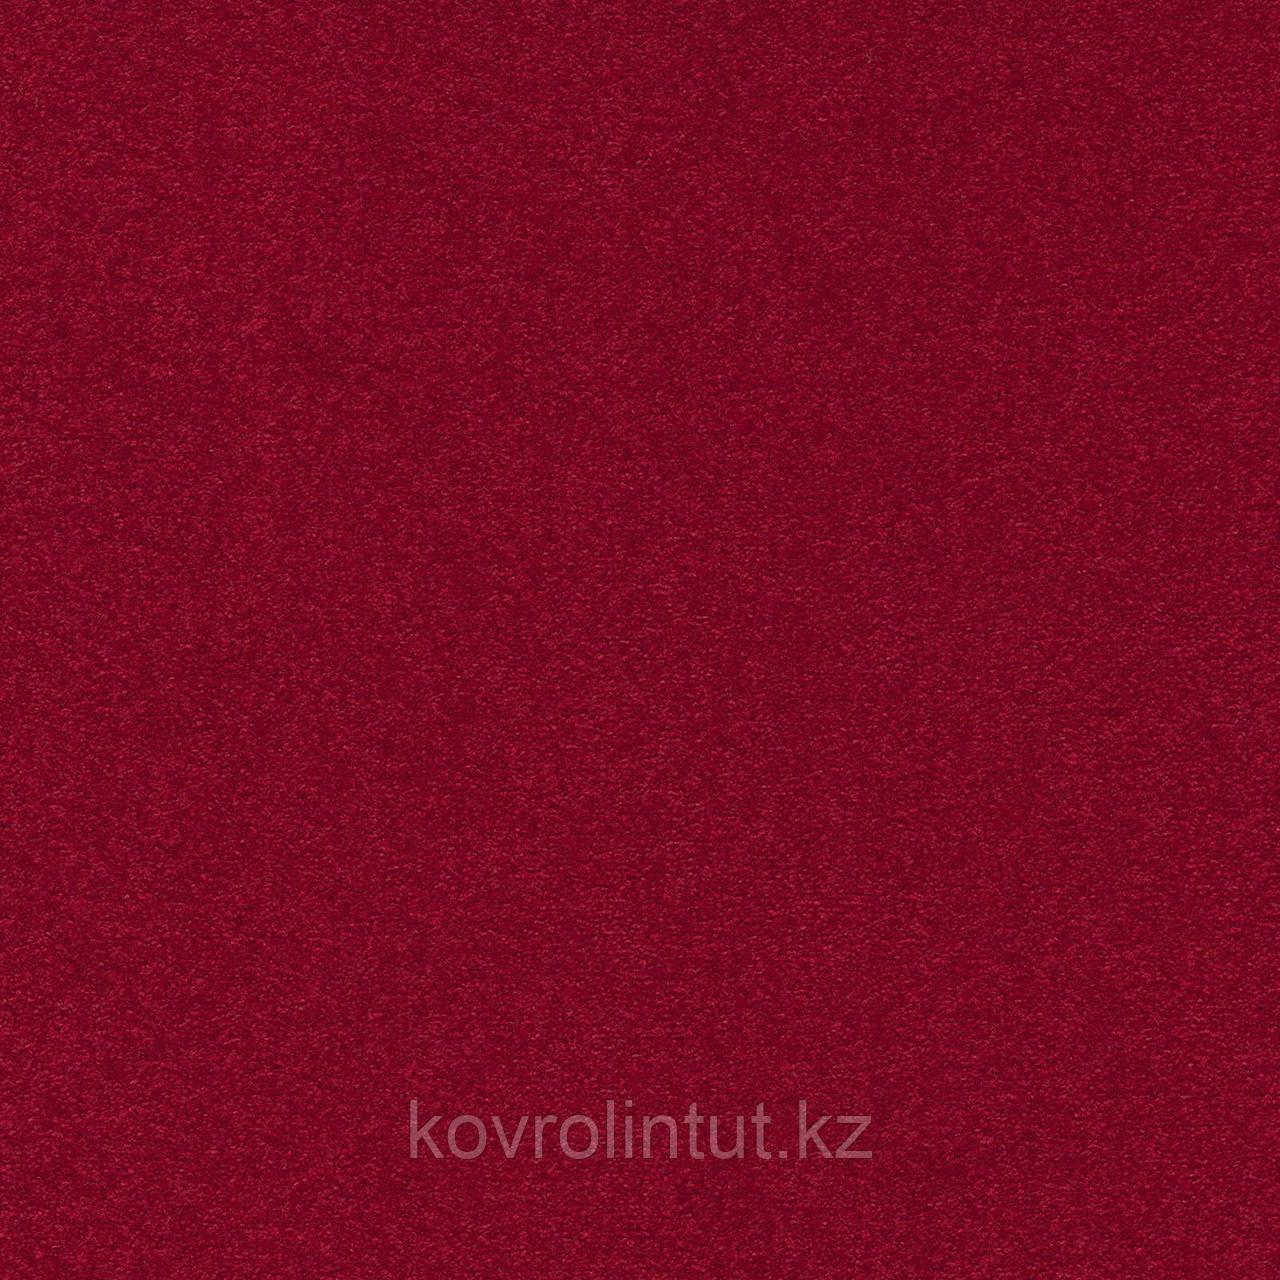 Плитка ковровая Modulyss Cambridge 316, 100% PA